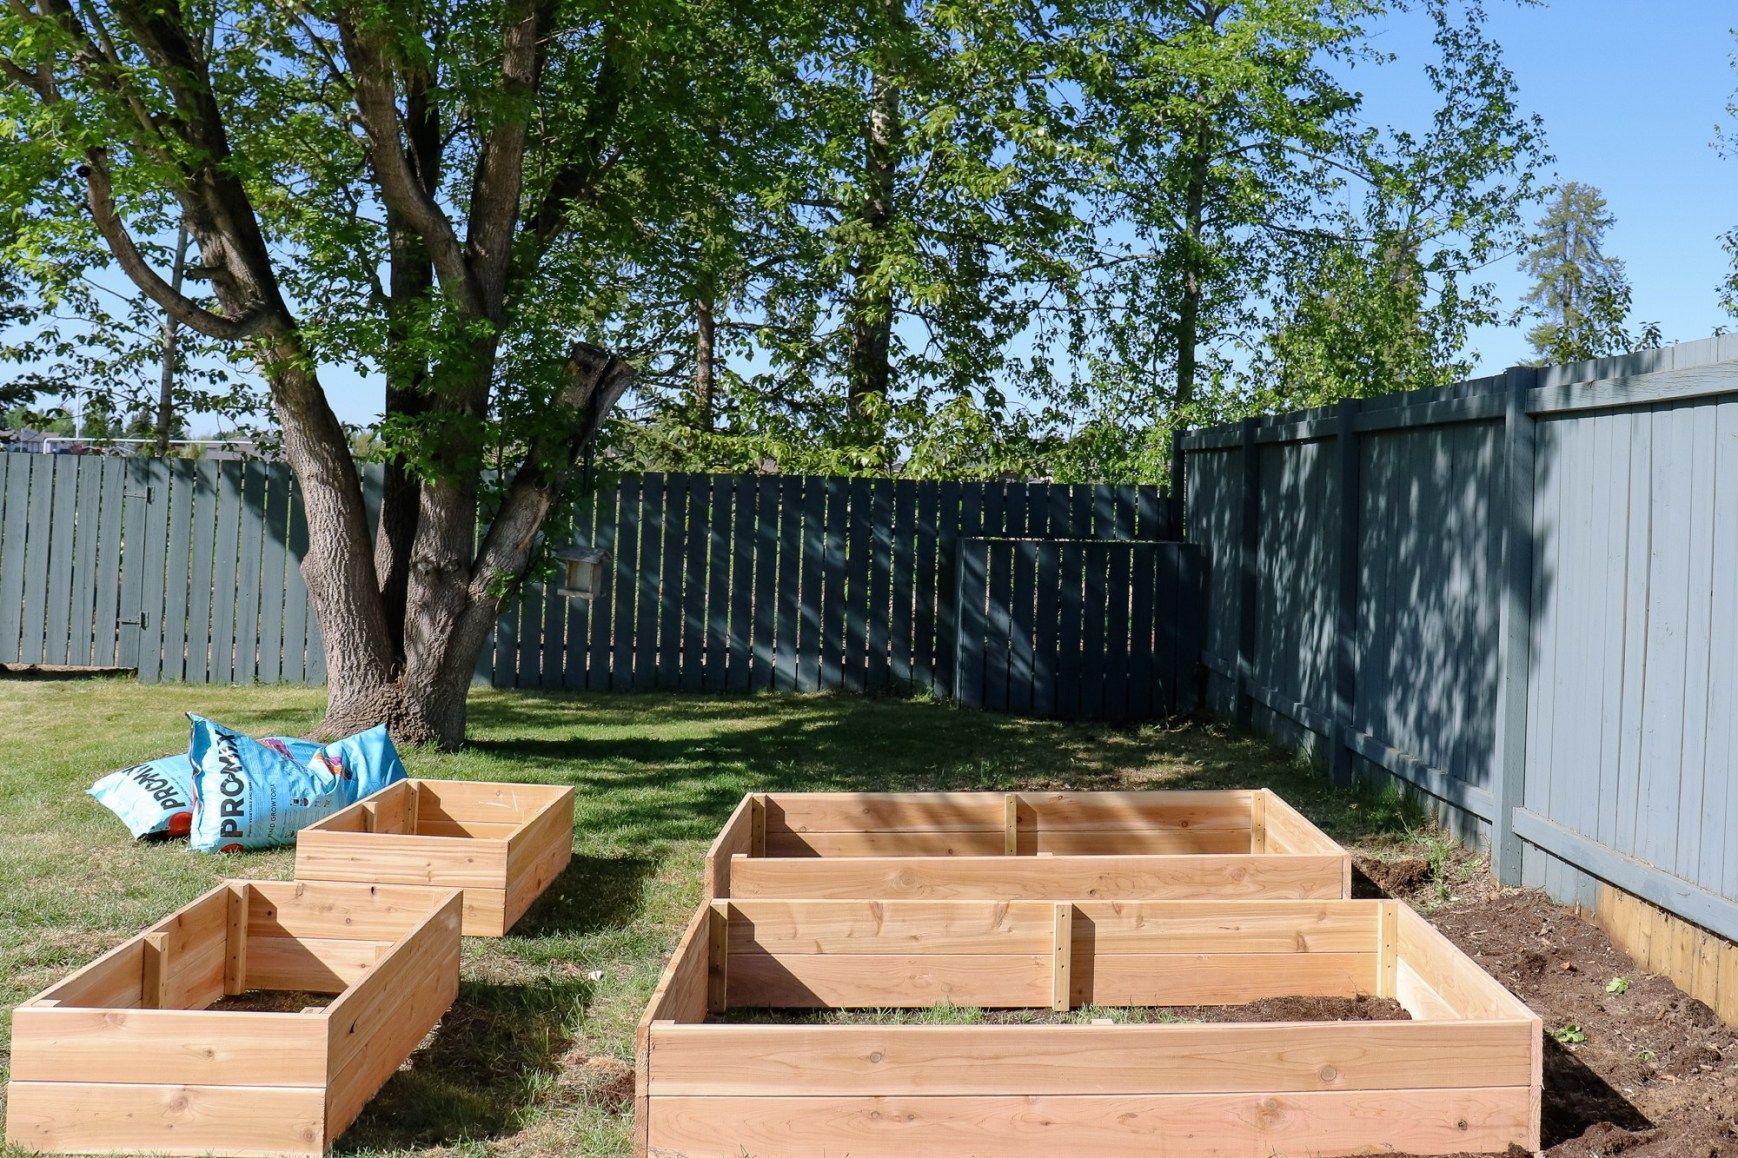 How to Build your own DIY Raised Garden Bed | Garden beds ...